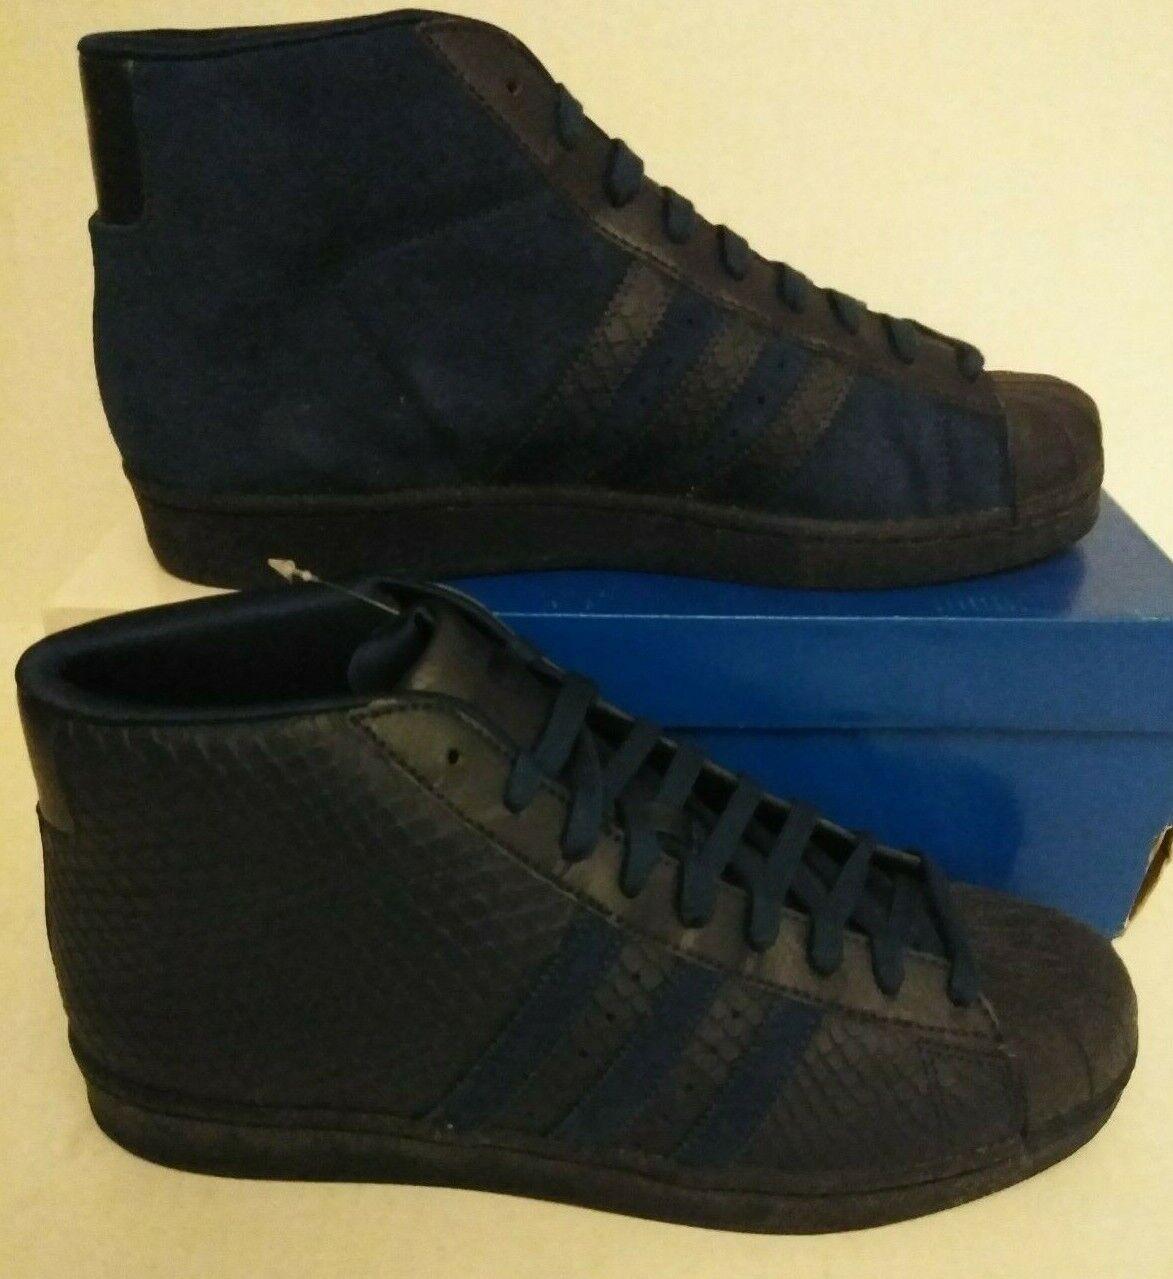 Adidas Originals pro model high top Hi NAVY BLUE SUEDE SHOES